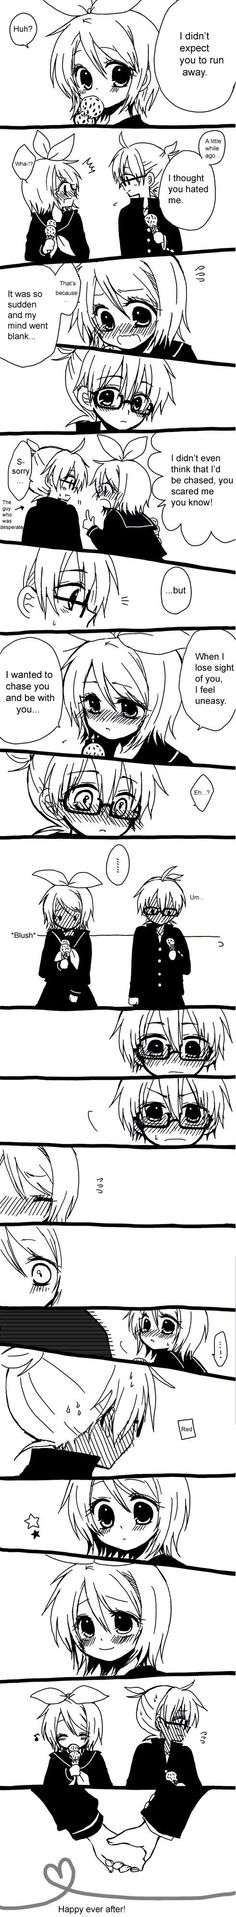 anime couples <3